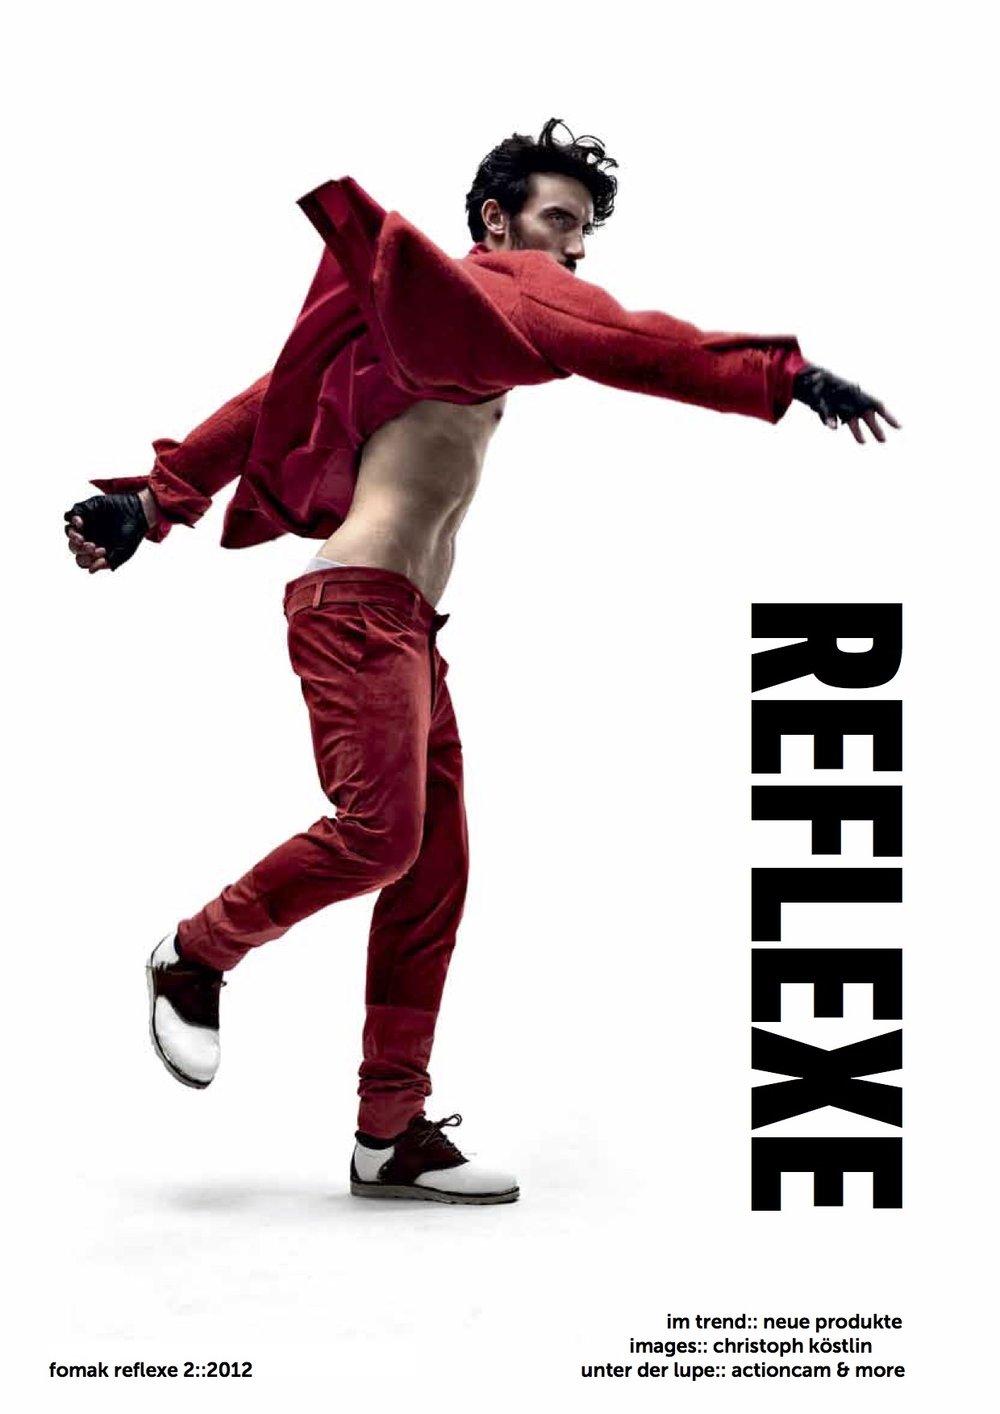 reflexe_2012-02_de.jpg